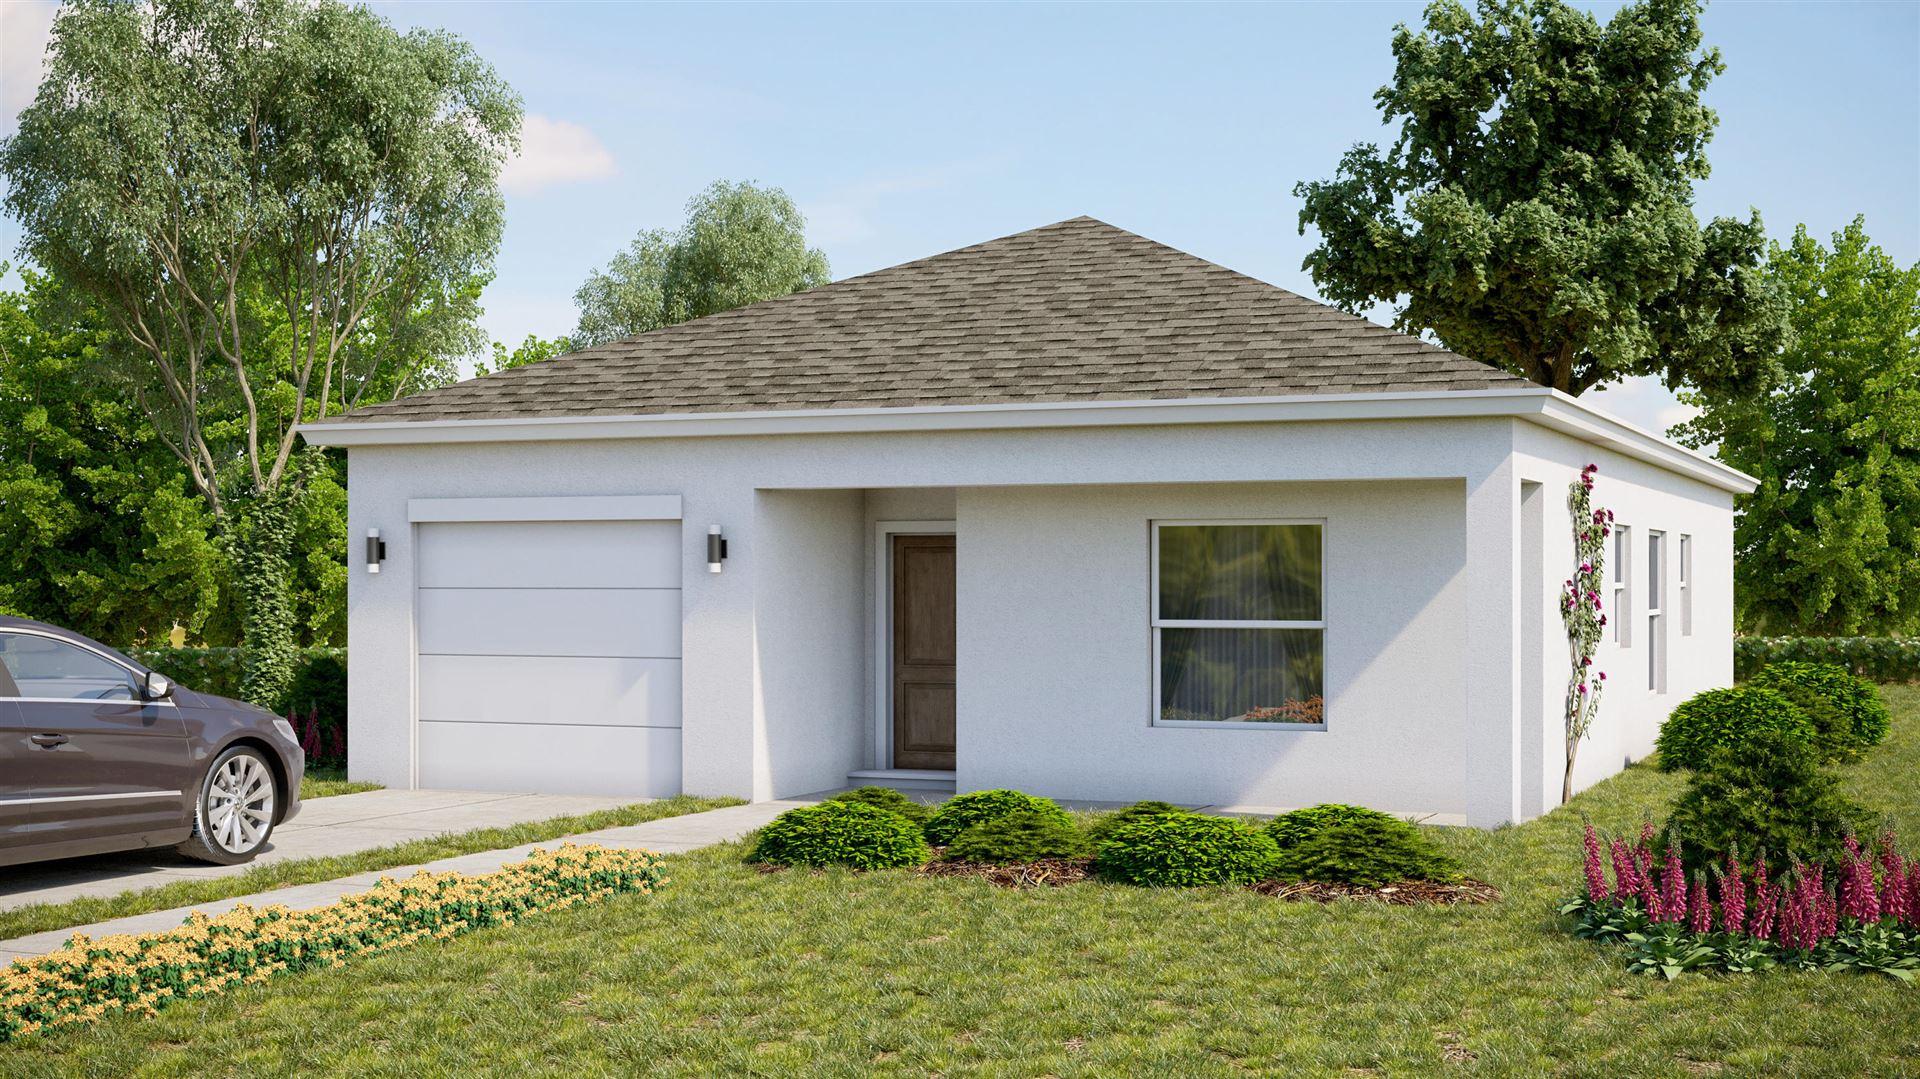 705 38th Street, West Palm Beach, FL 33407 - #: RX-10619210